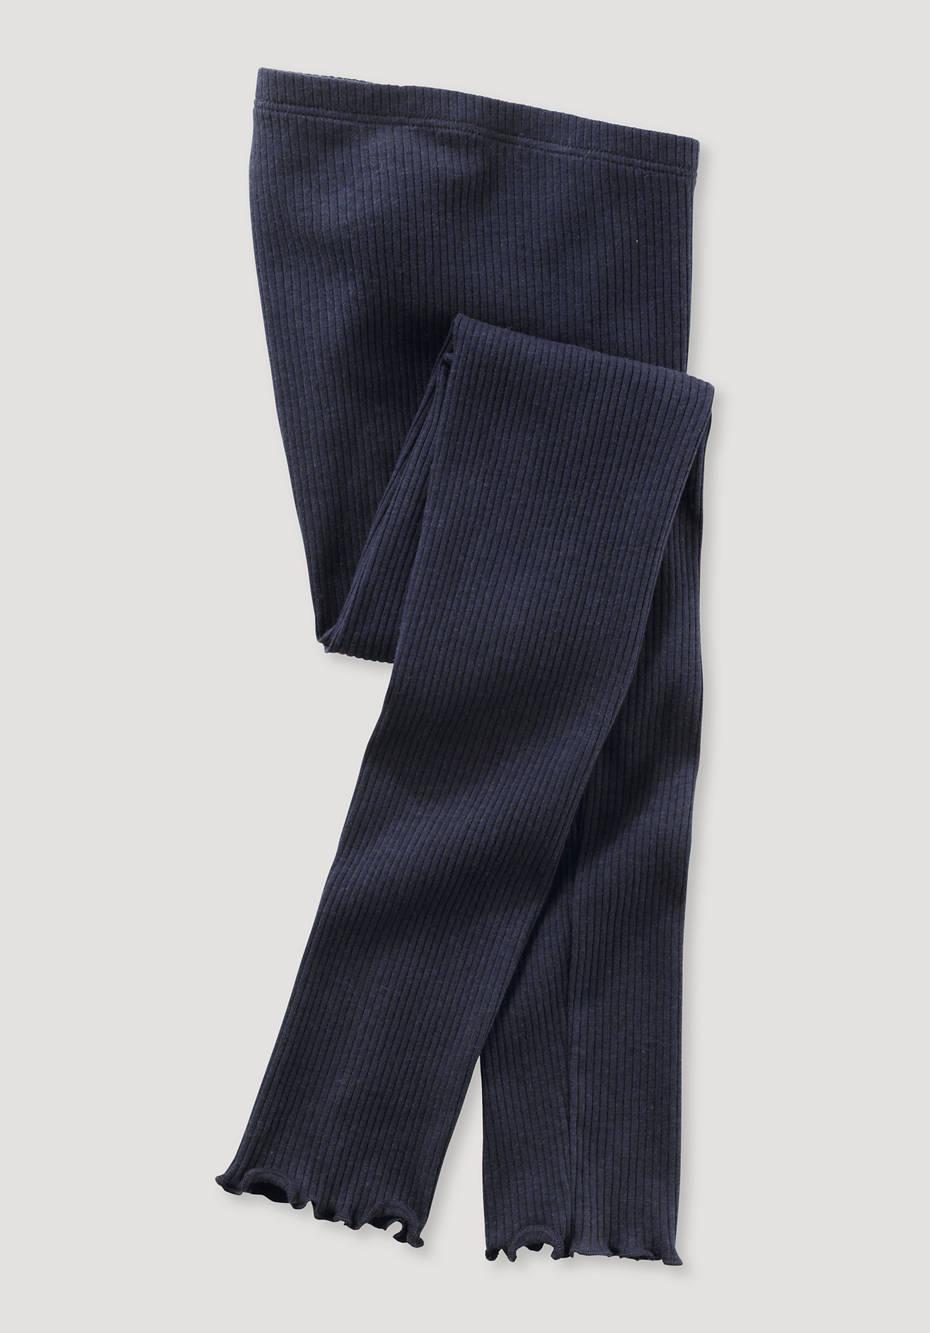 Leggings made of organic cotton with organic virgin wool